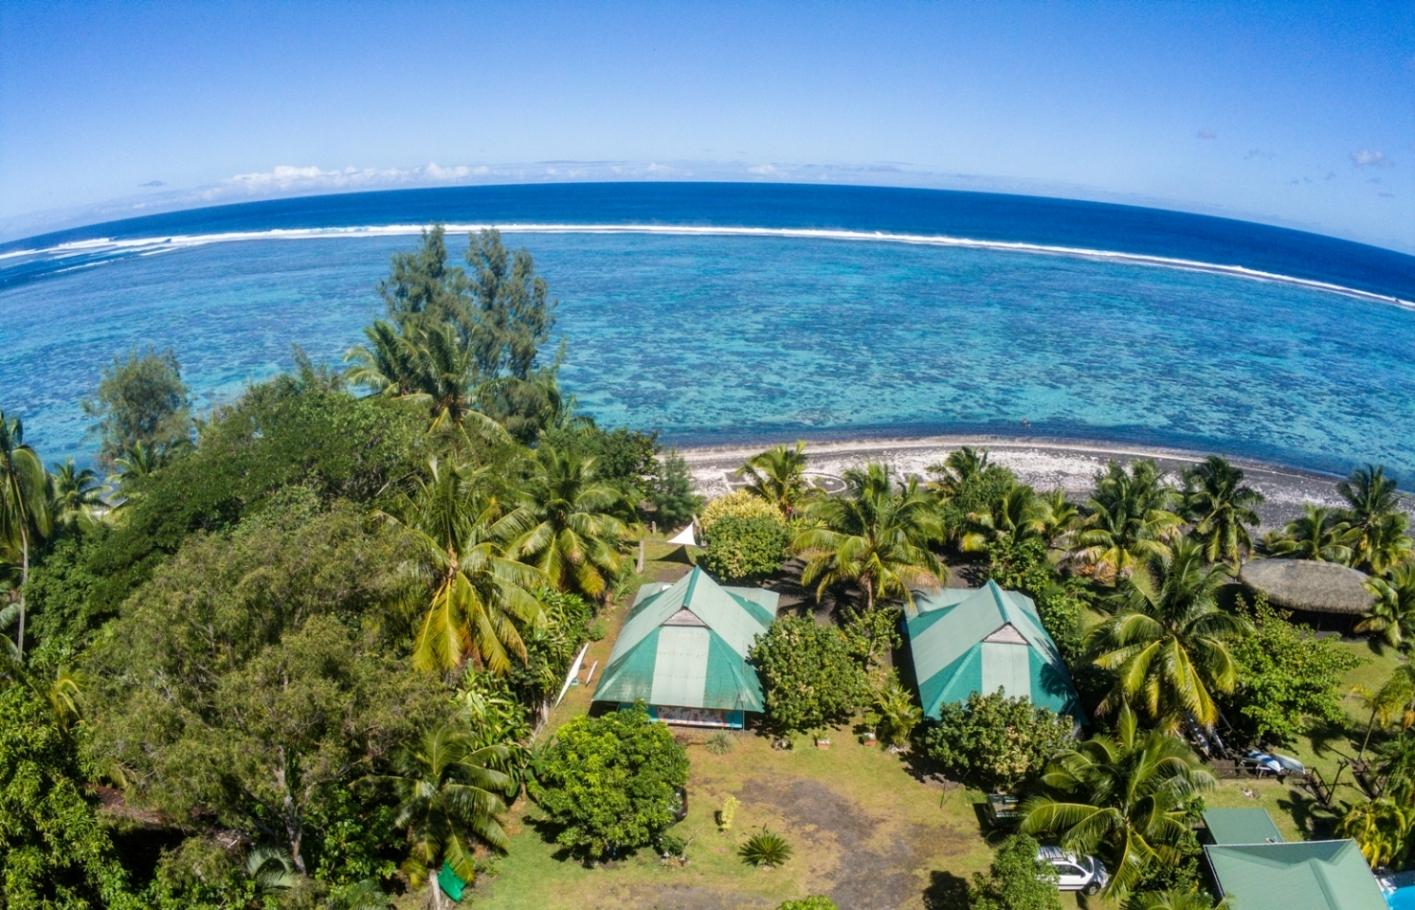 https://tahititourisme.es/wp-content/uploads/2019/08/copie-Tahiti-tourisme-948ko.jpg